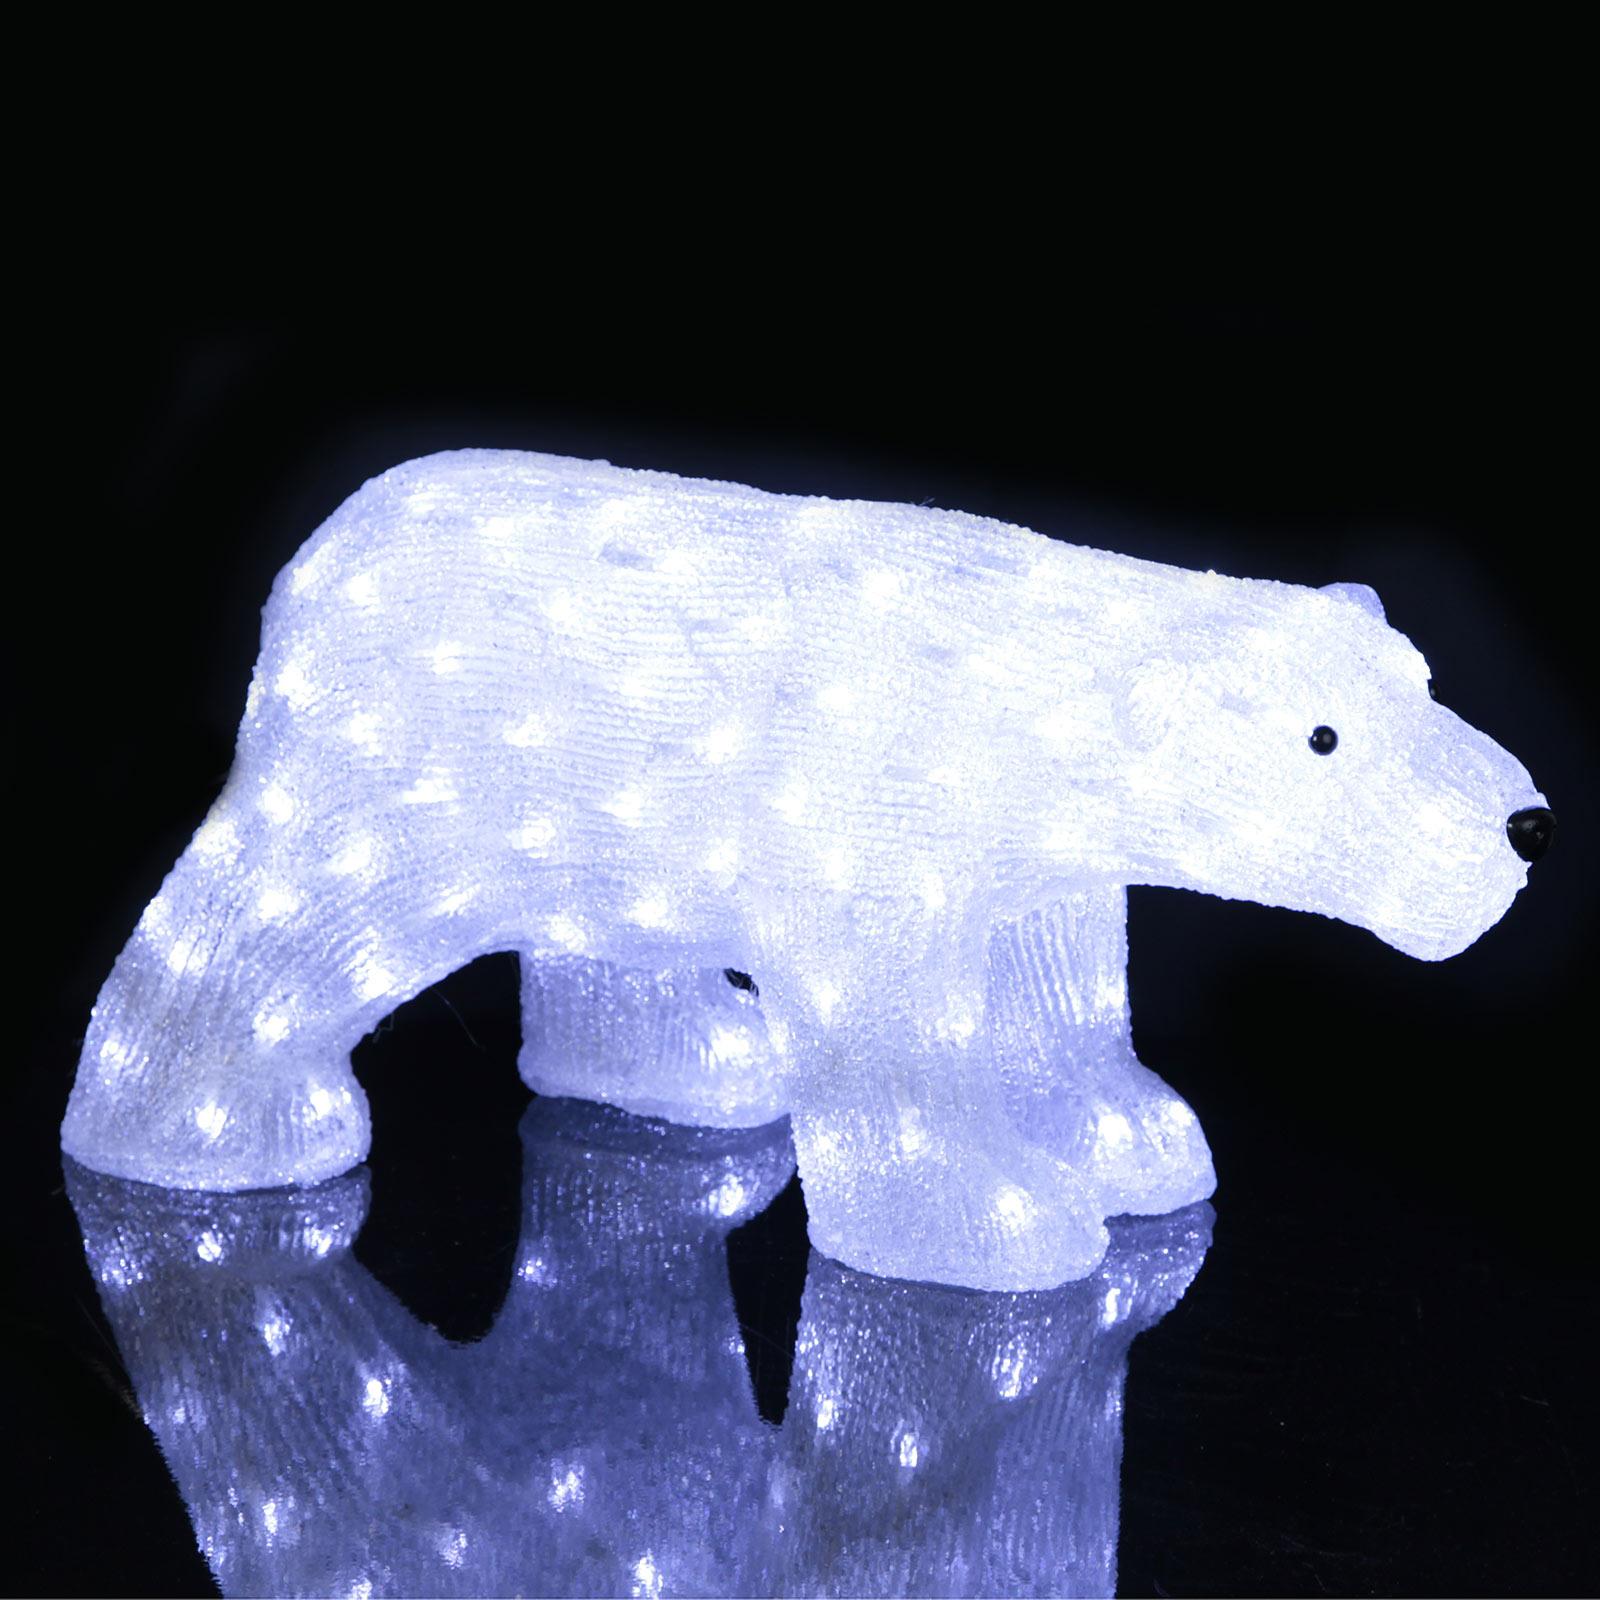 LED-figur Crystalo isbjörn för utomhusbruk, längd